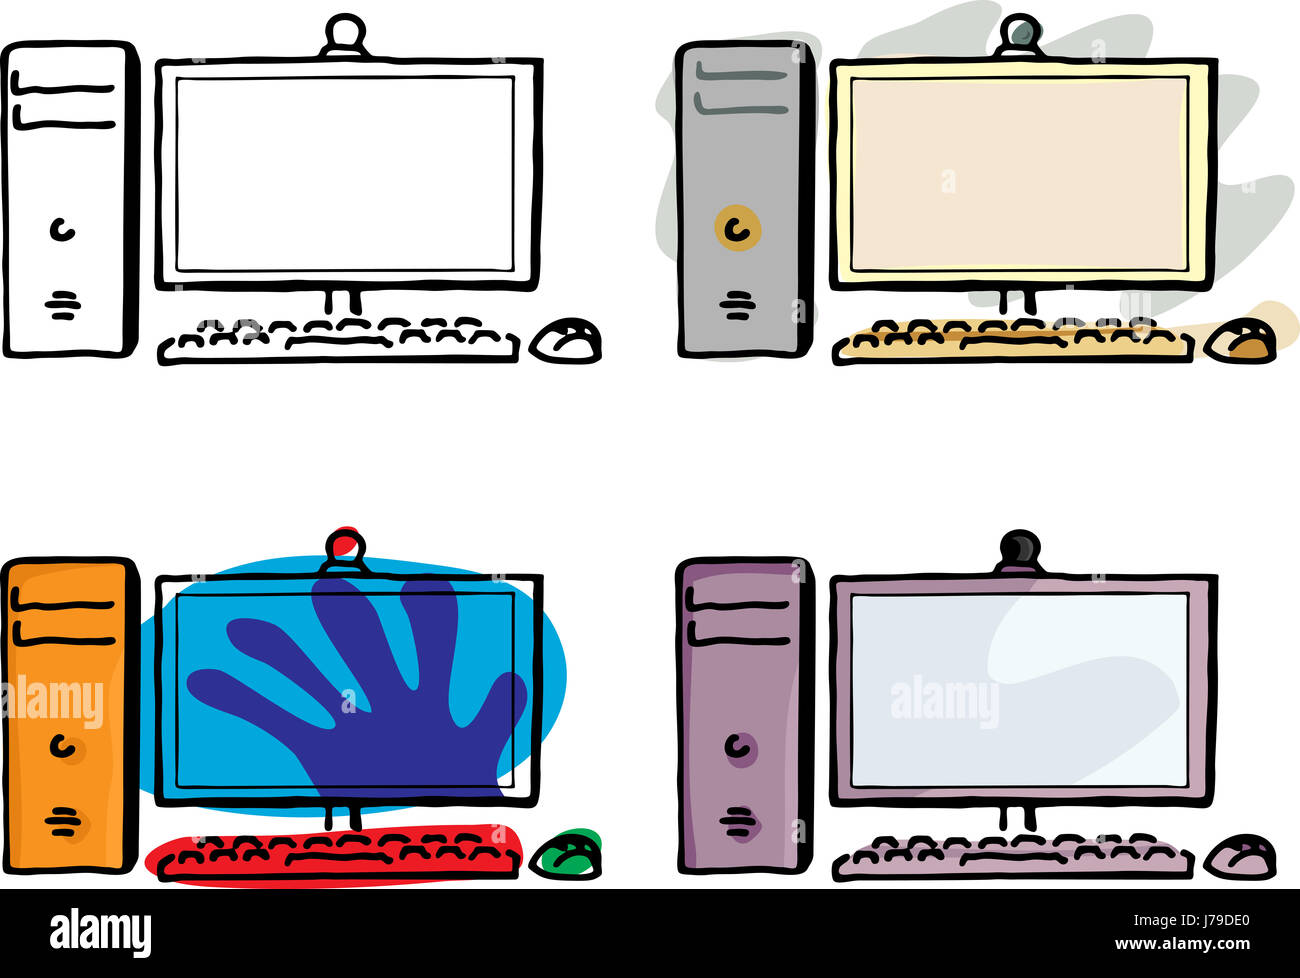 Desktop Cartoon Computers Computer Keyboard Pc Computers Computer Stock Photo Alamy